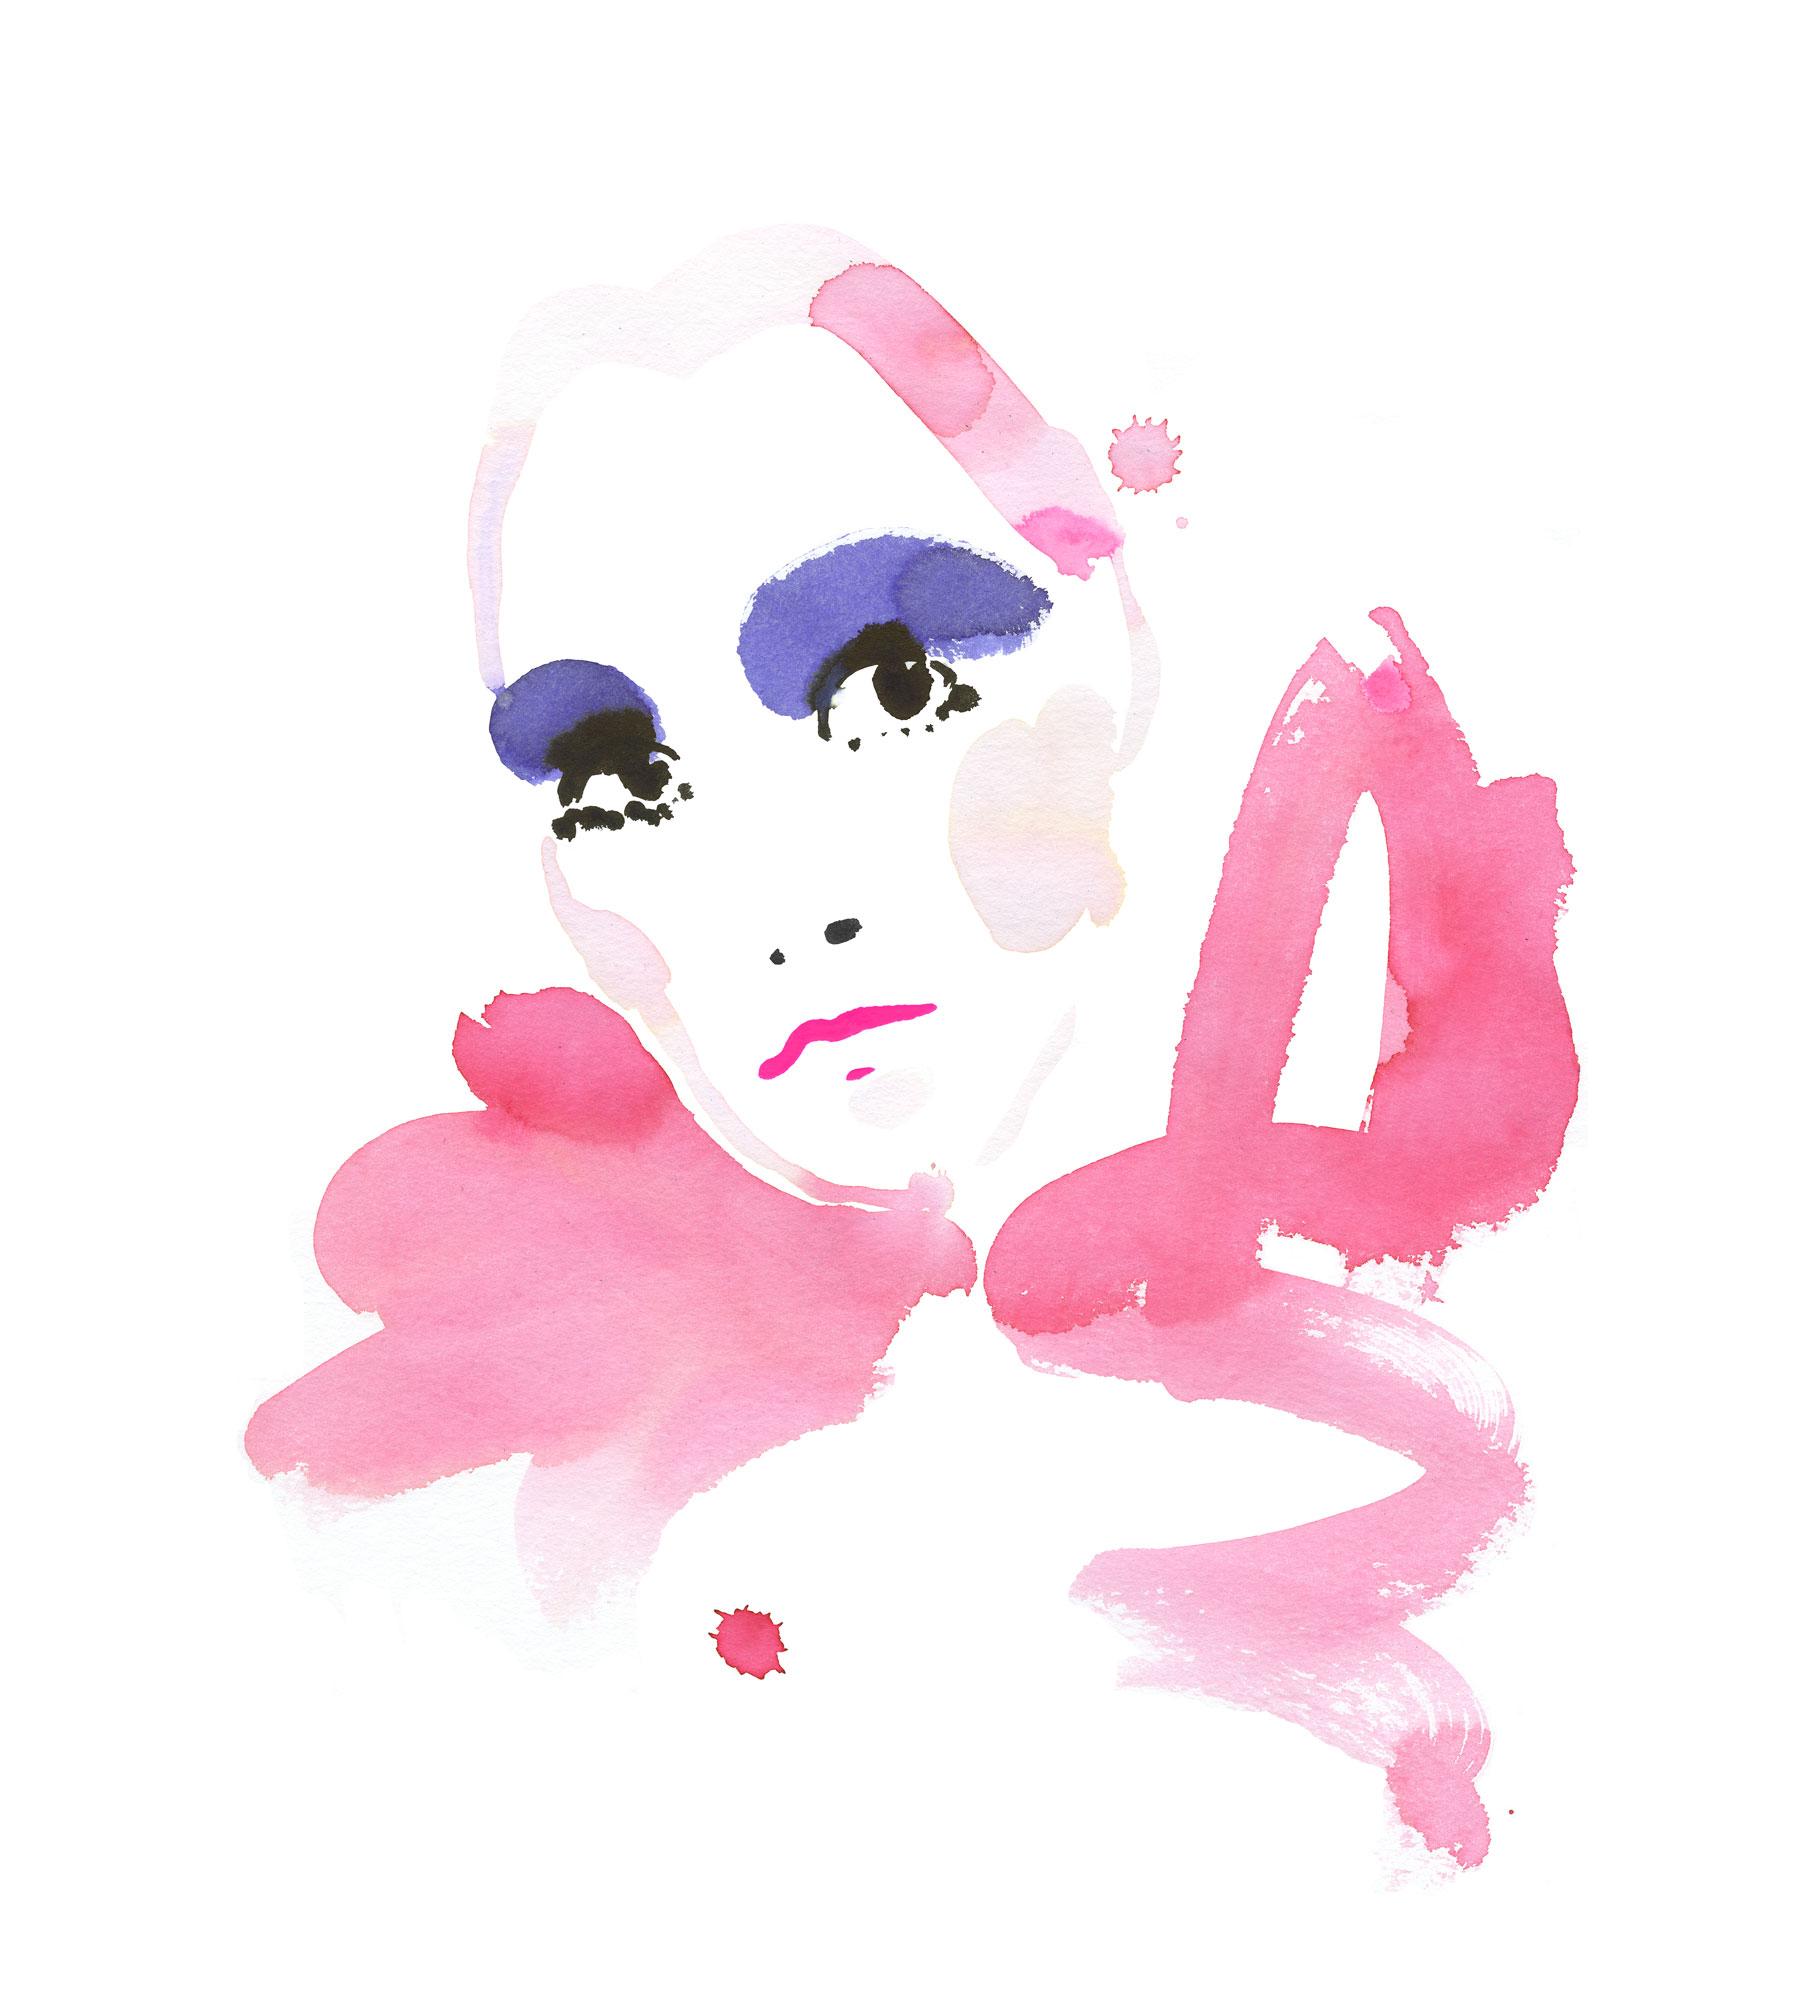 Lovisa-Burfitt-illustration-Glam-rosie